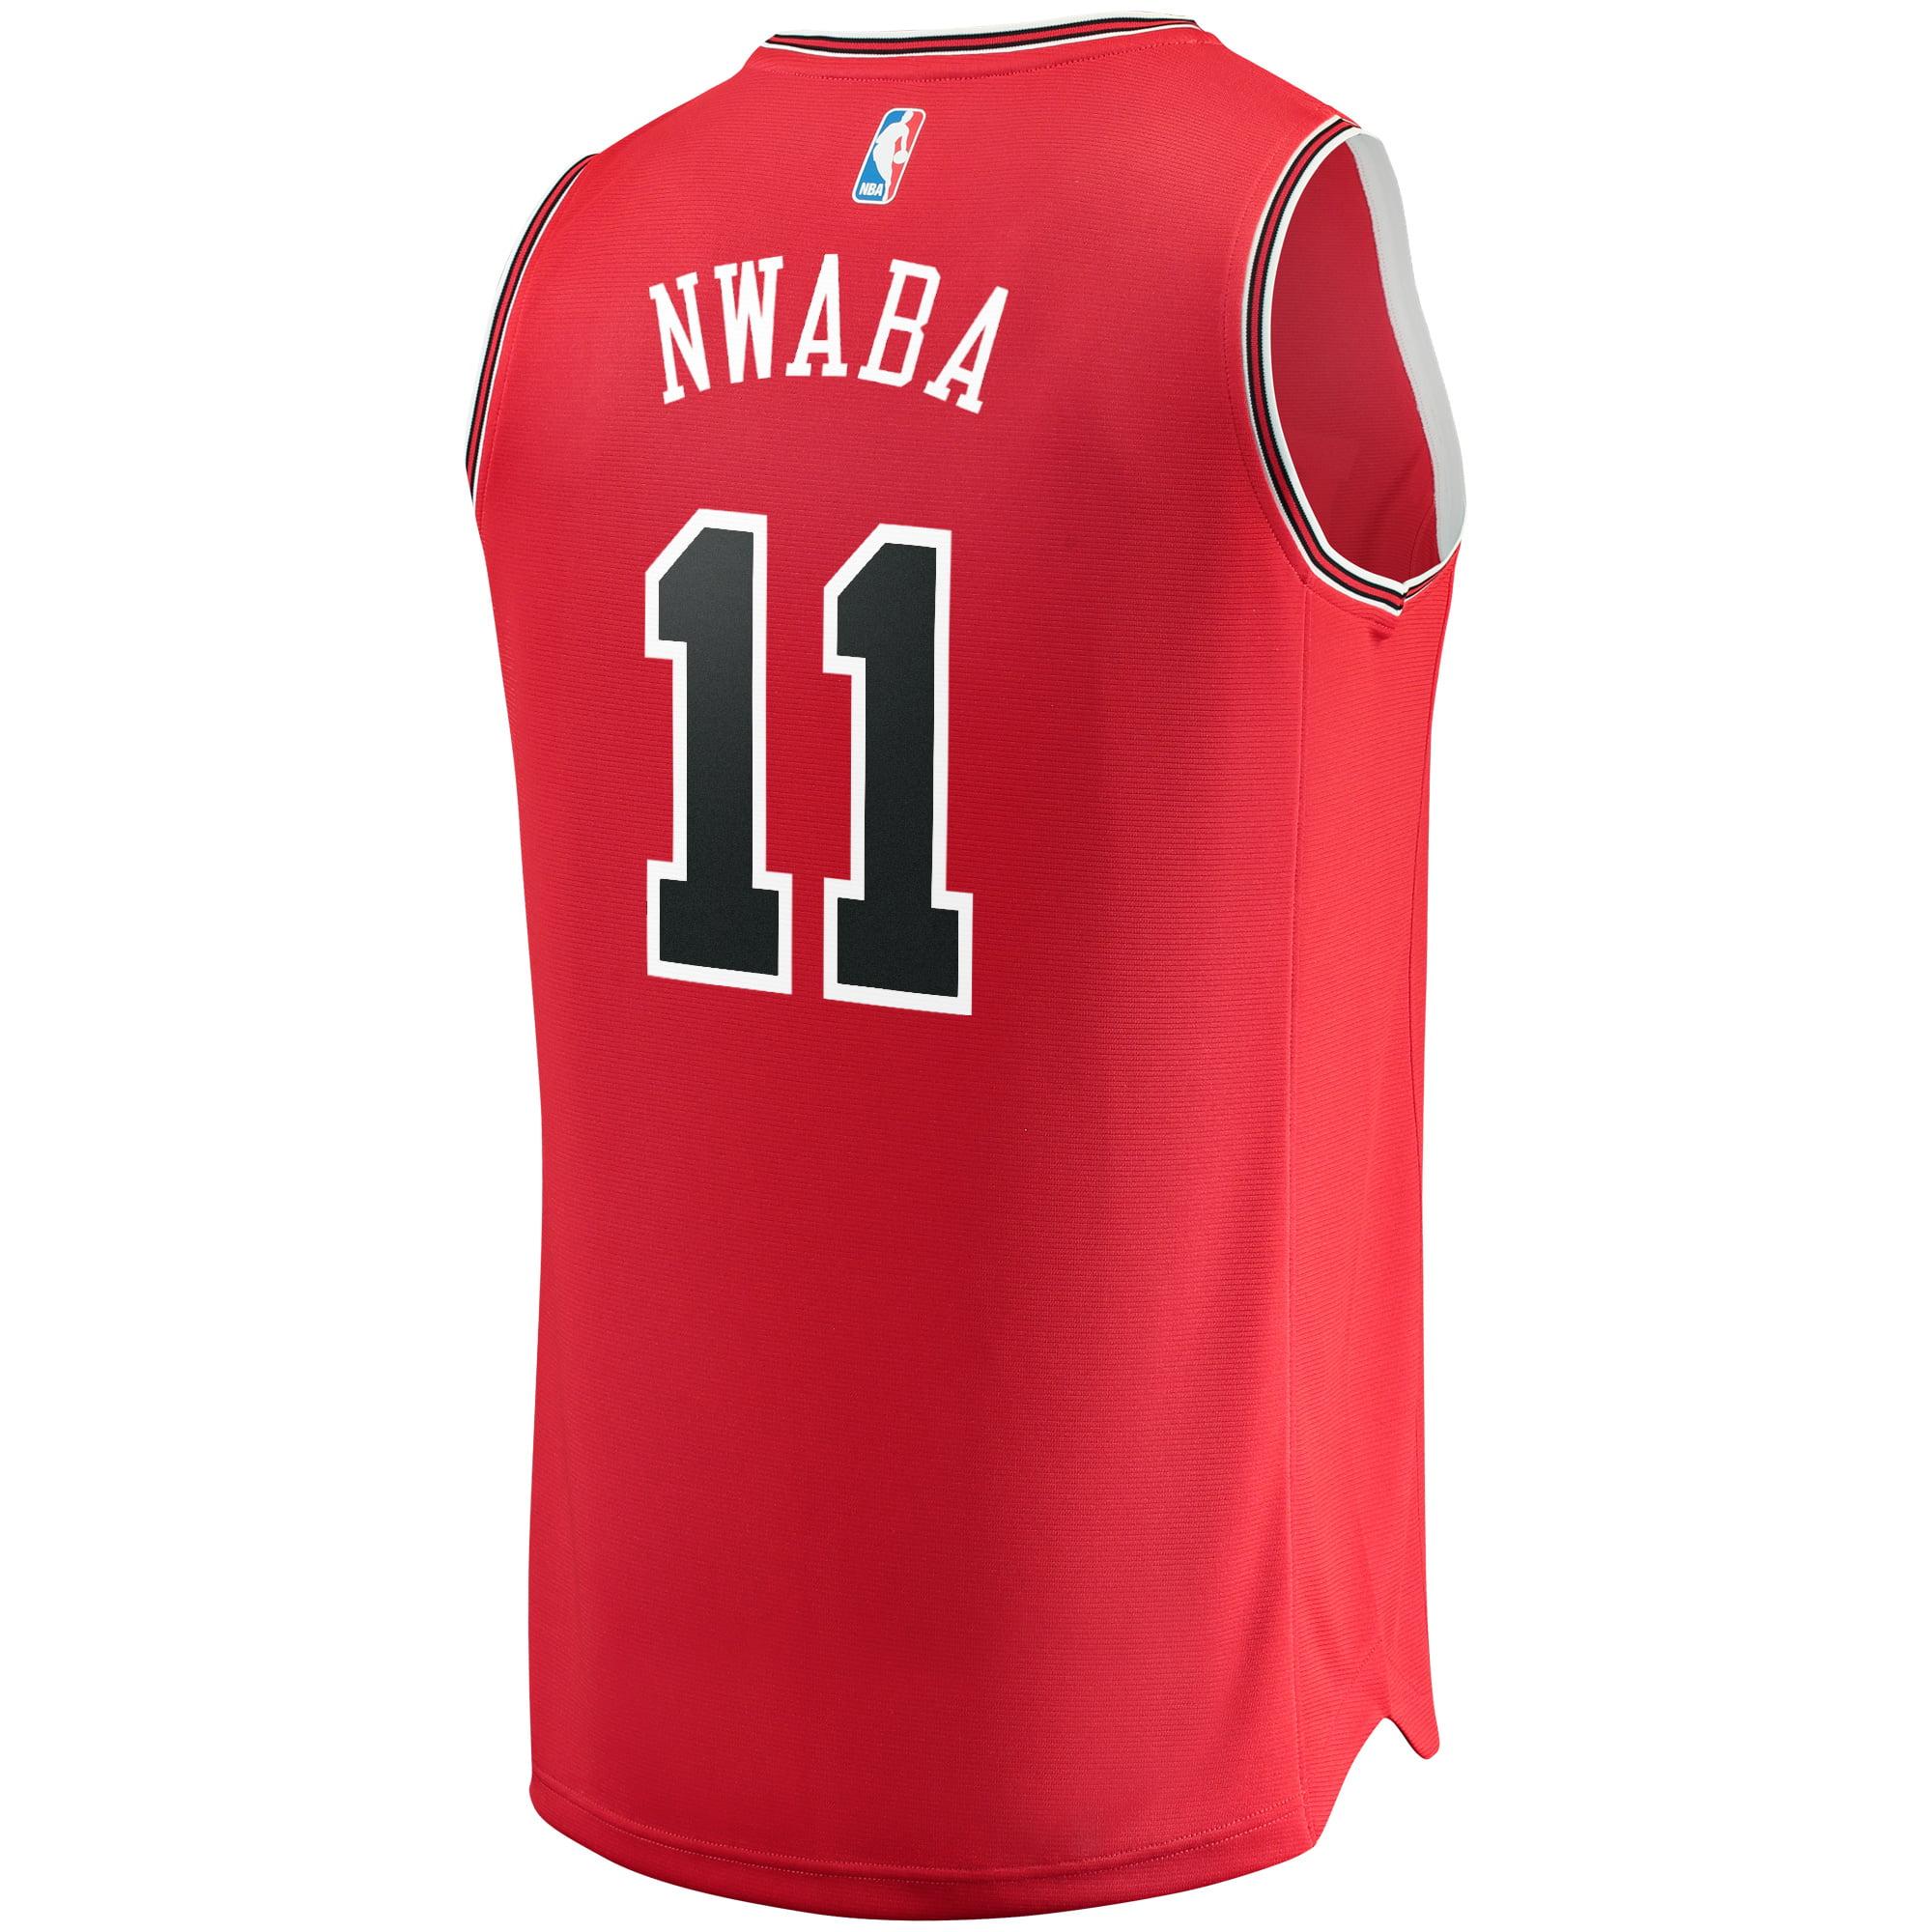 sale retailer 5e962 8351d David Nwaba Chicago Bulls Fanatics Branded Fast Break Road Replica Player  Jersey Red - Icon Edition